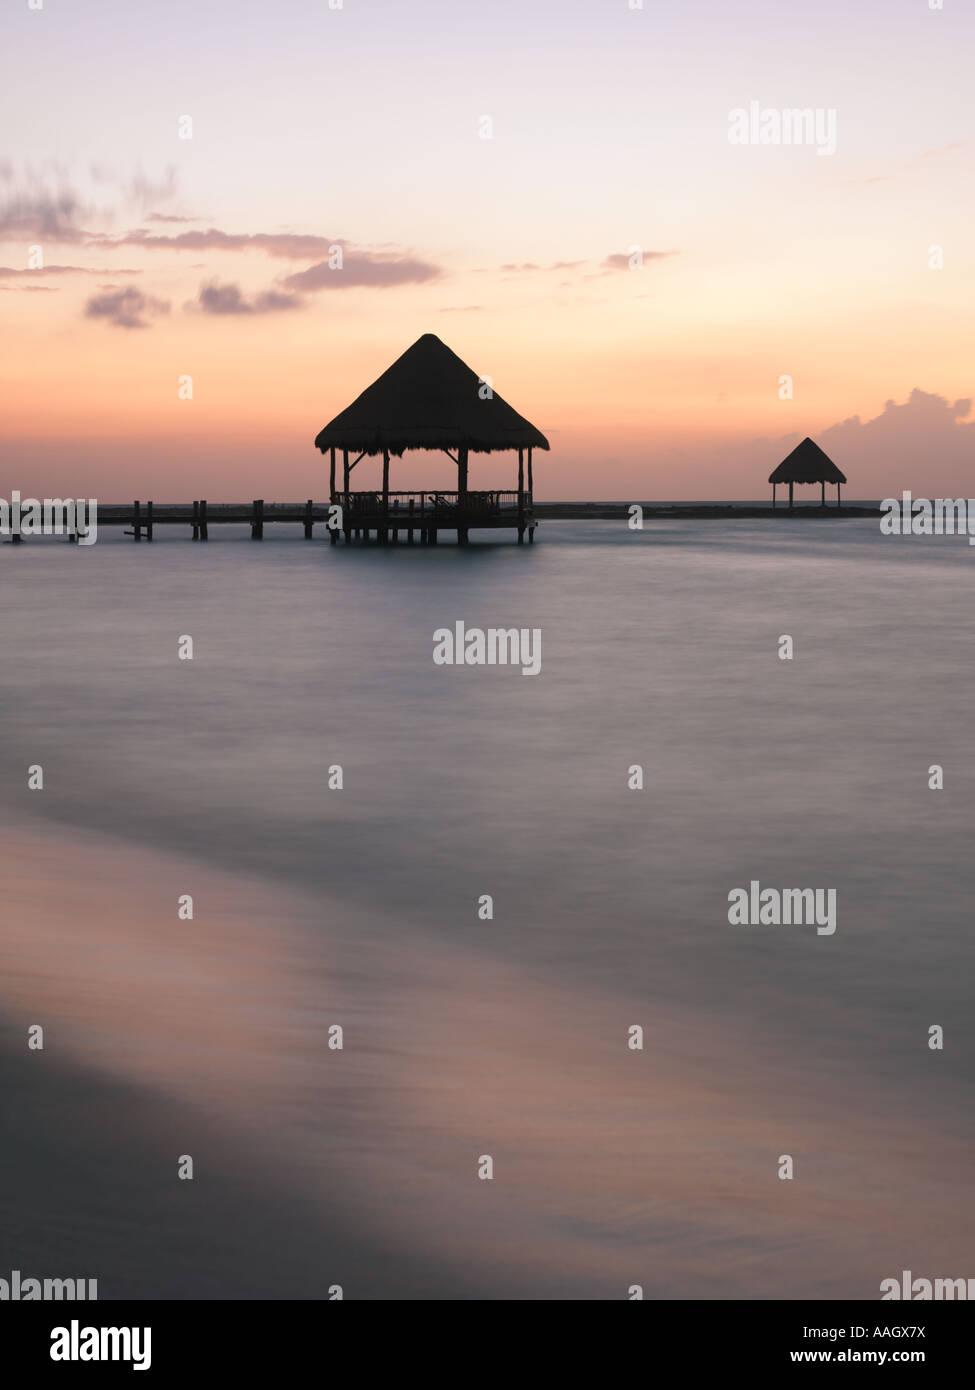 Mexico Quintana Roo Yucatan Peninsula Akumal Mayan Riviera pier with palapa jutting out to the water from the beach - Stock Image